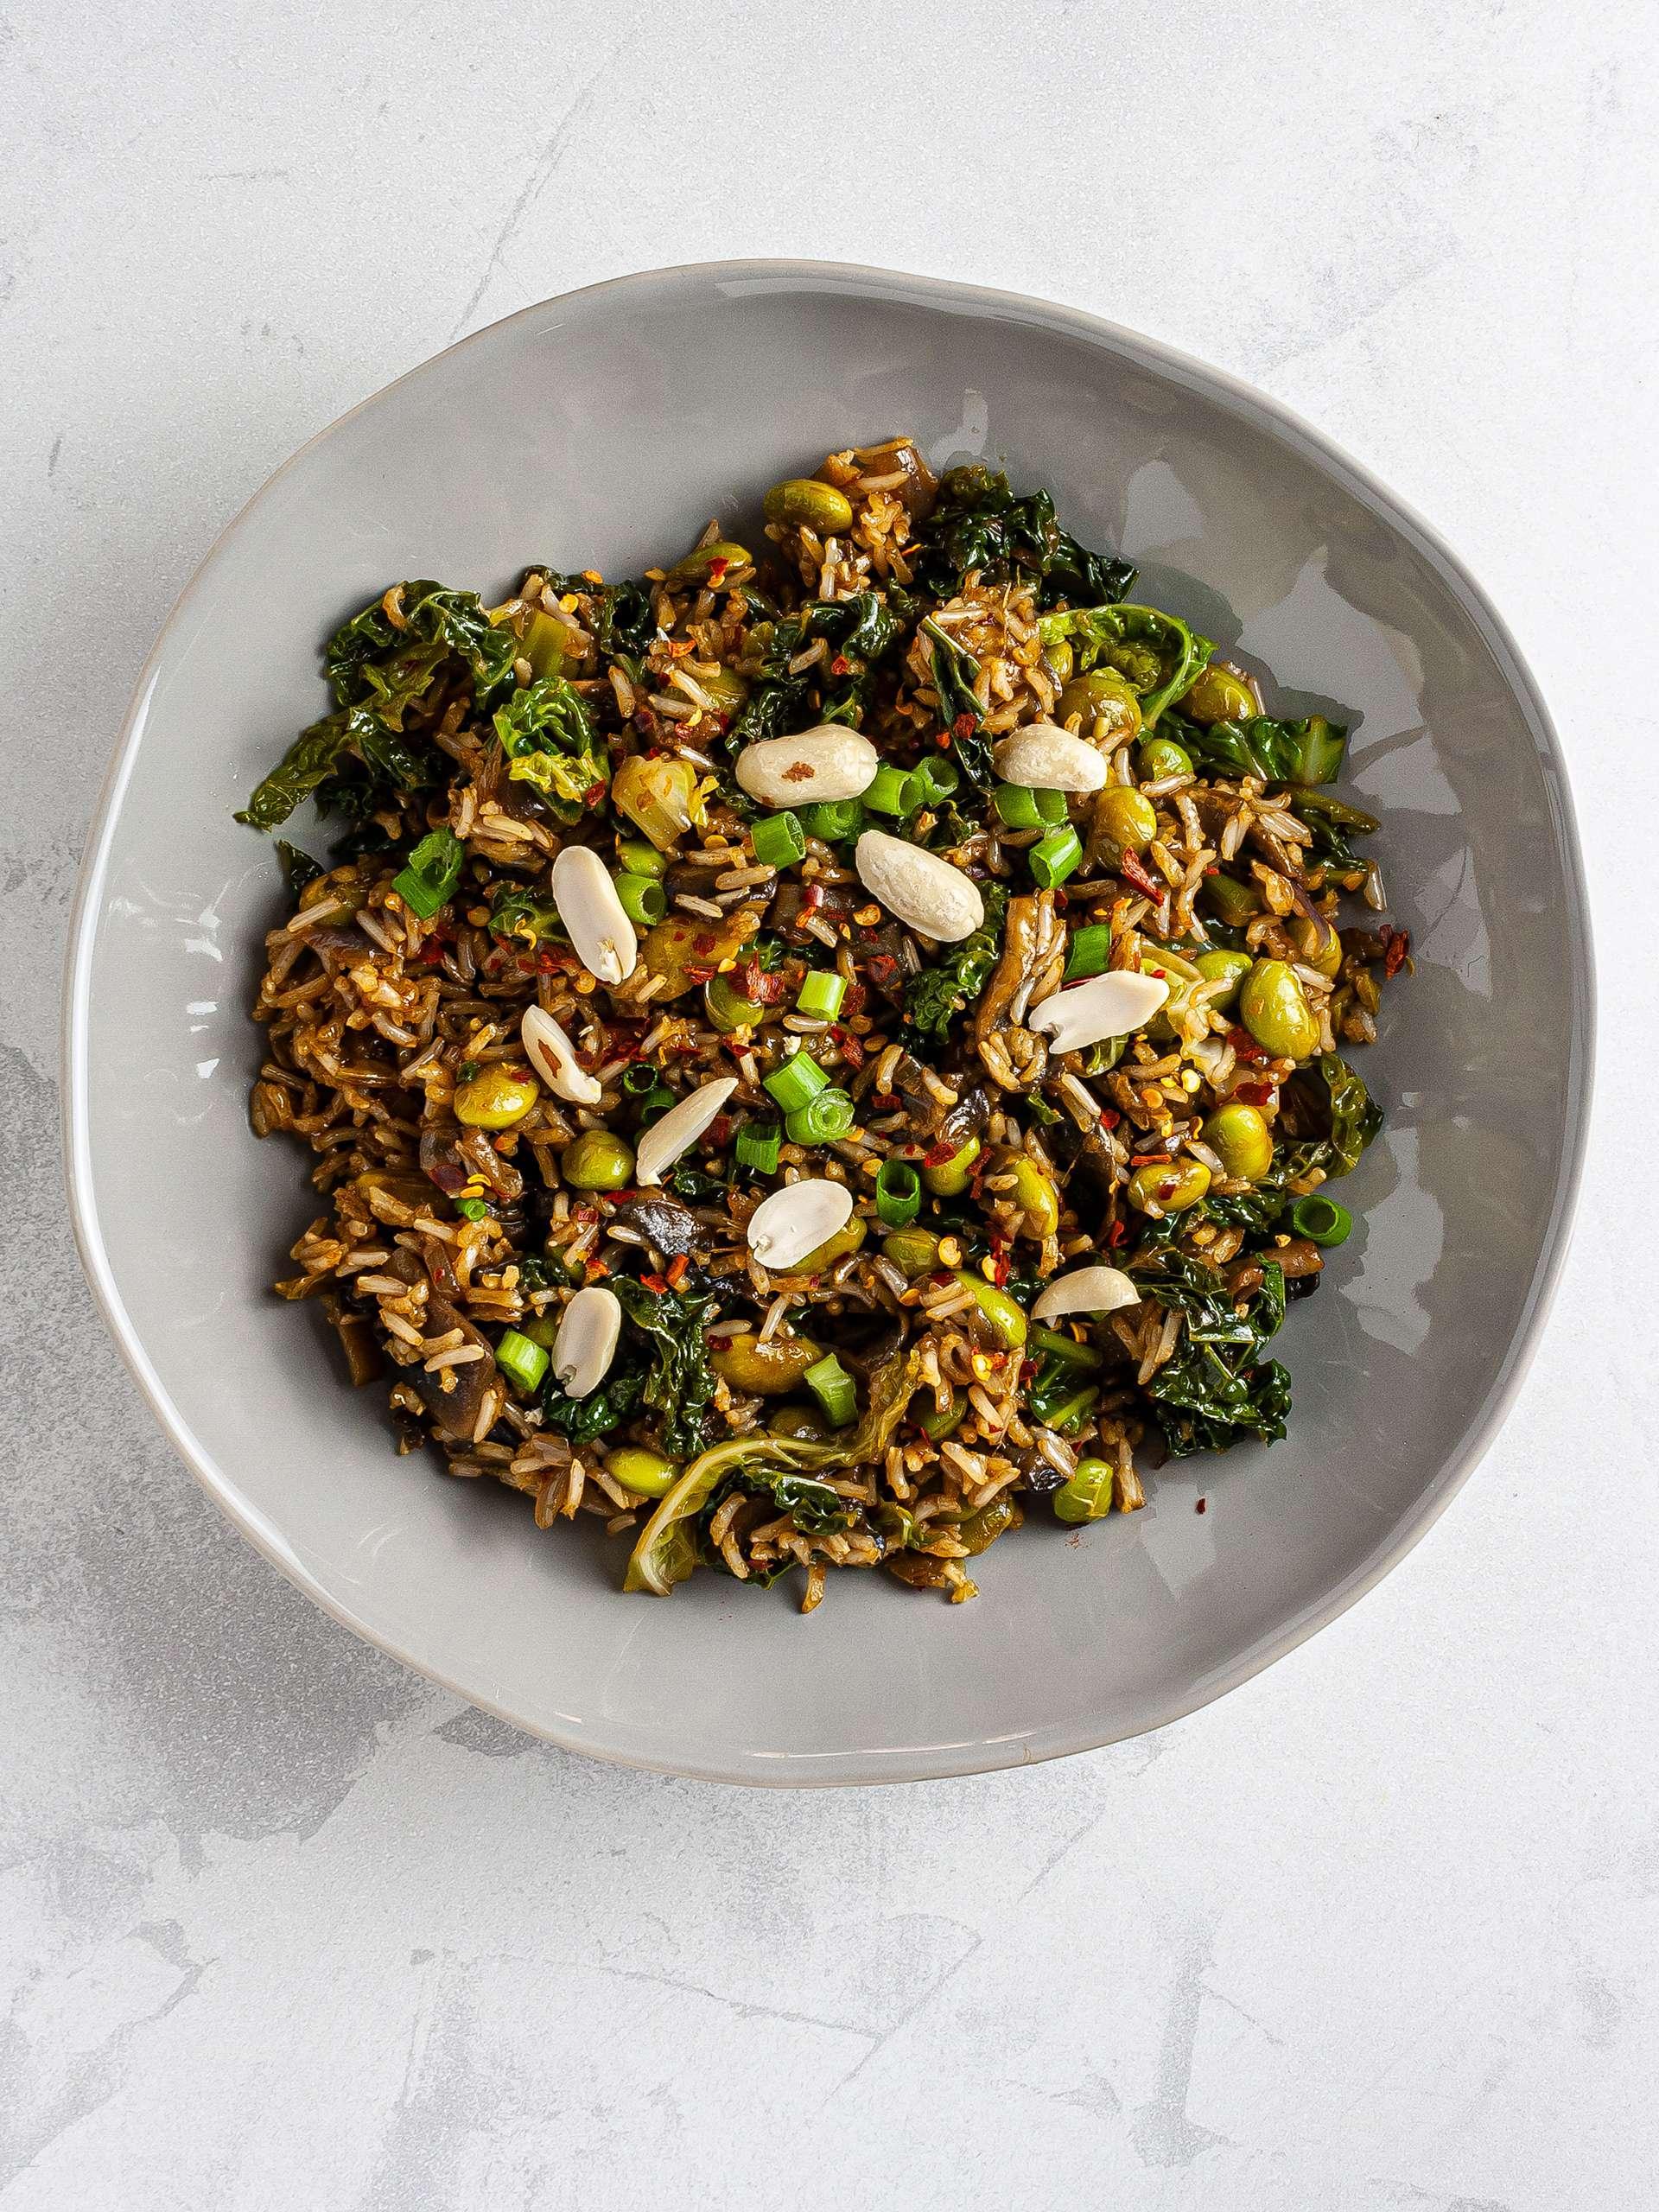 Vegan nasi goreng rice with peanuts